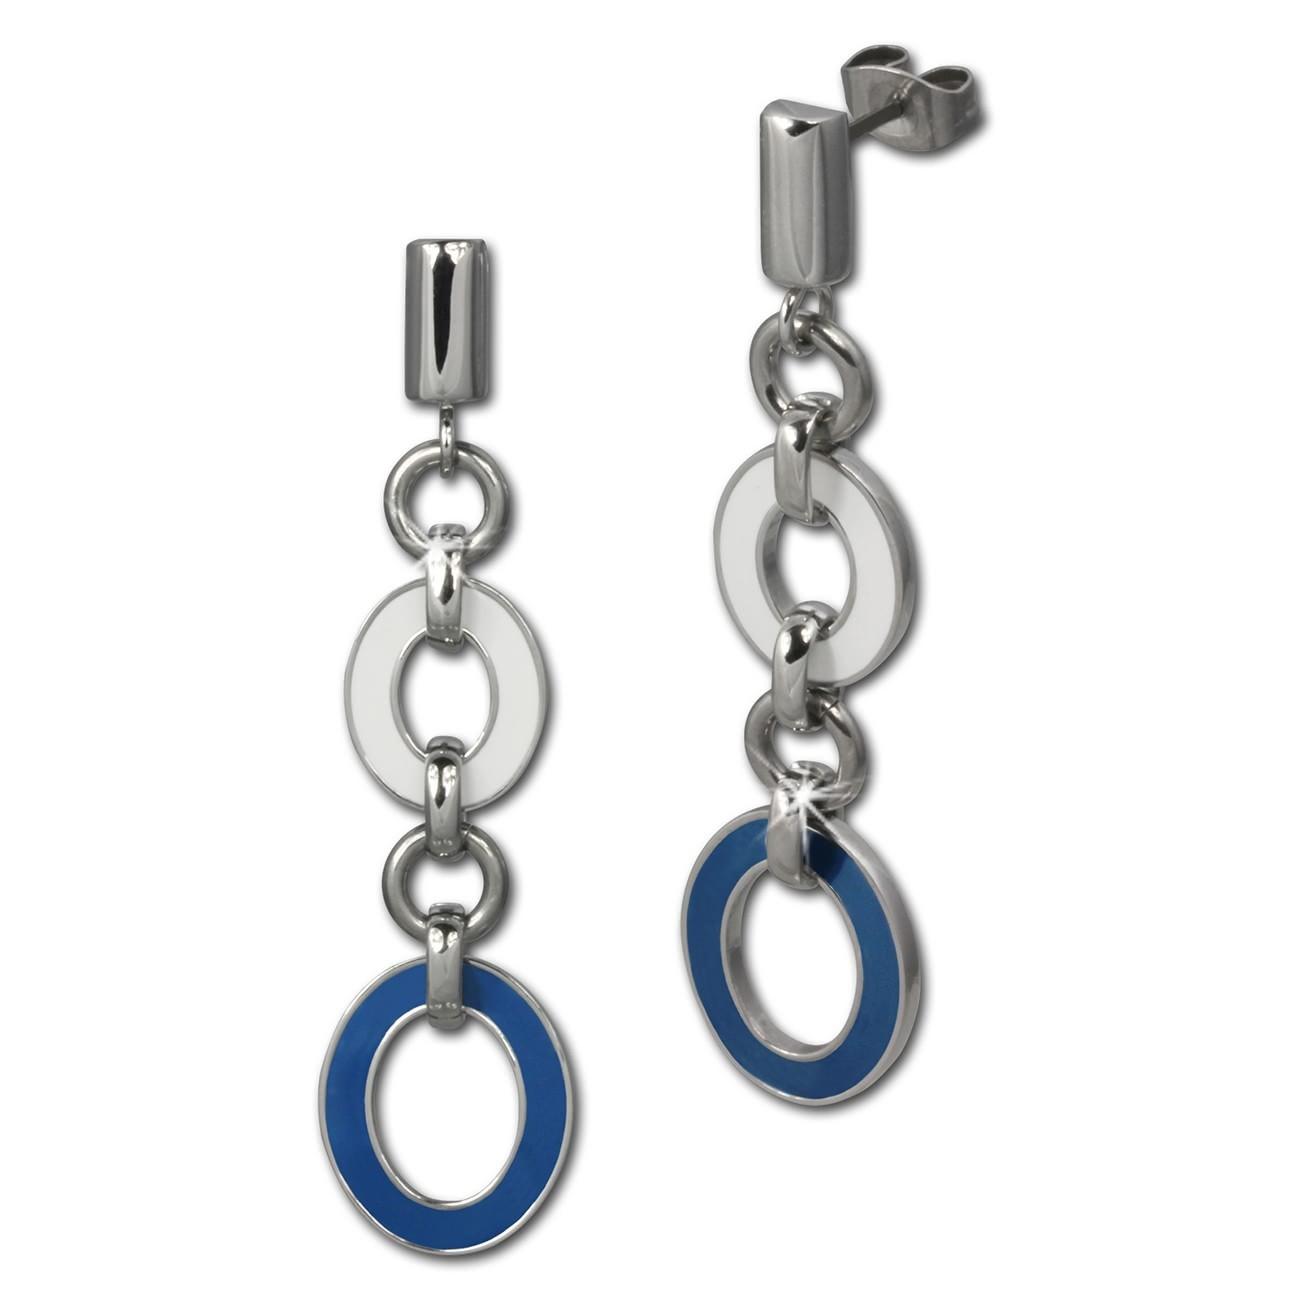 Amello Ohrstecker Oval Emaille blau/weiß Ohrringe Damen Edelstahl ESOG01B